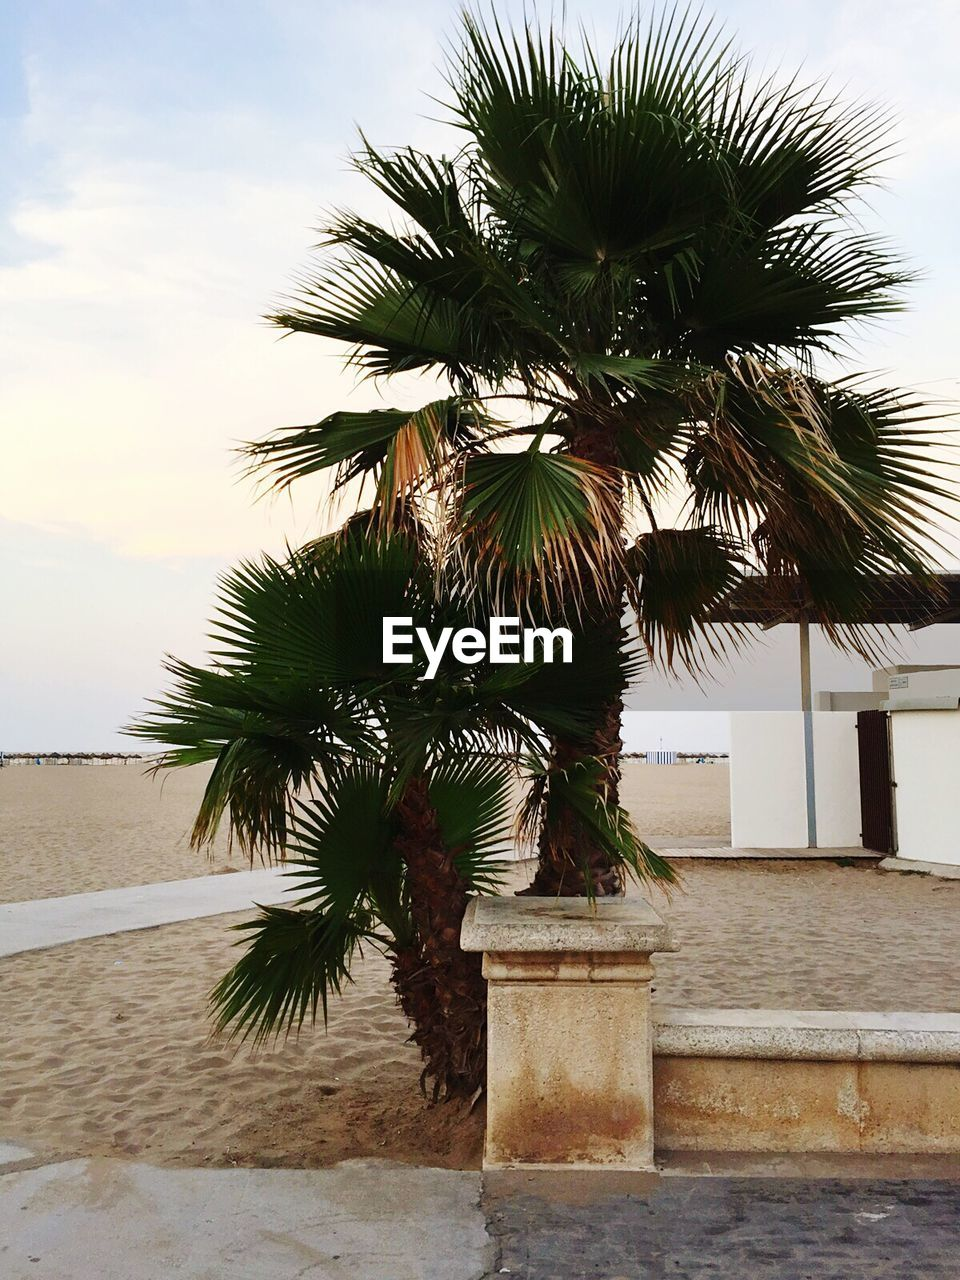 Palm Trees Growing On Beach Against Sky